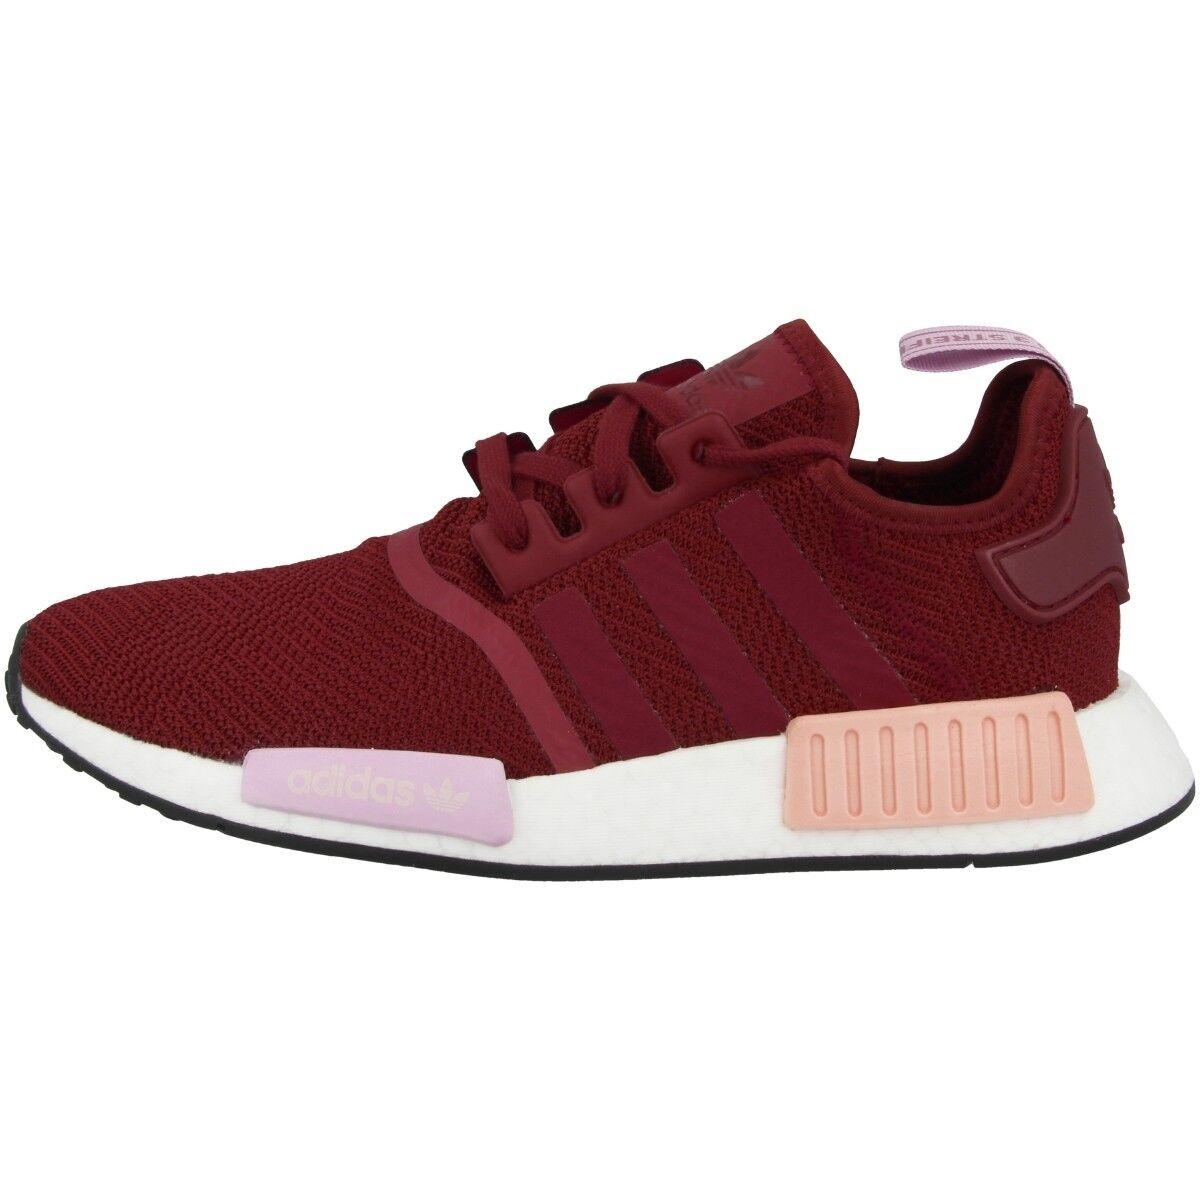 Adidas NMD_R1 damen Schuhe Damen Originals Turnschuhe burgundy clear Orange B37646